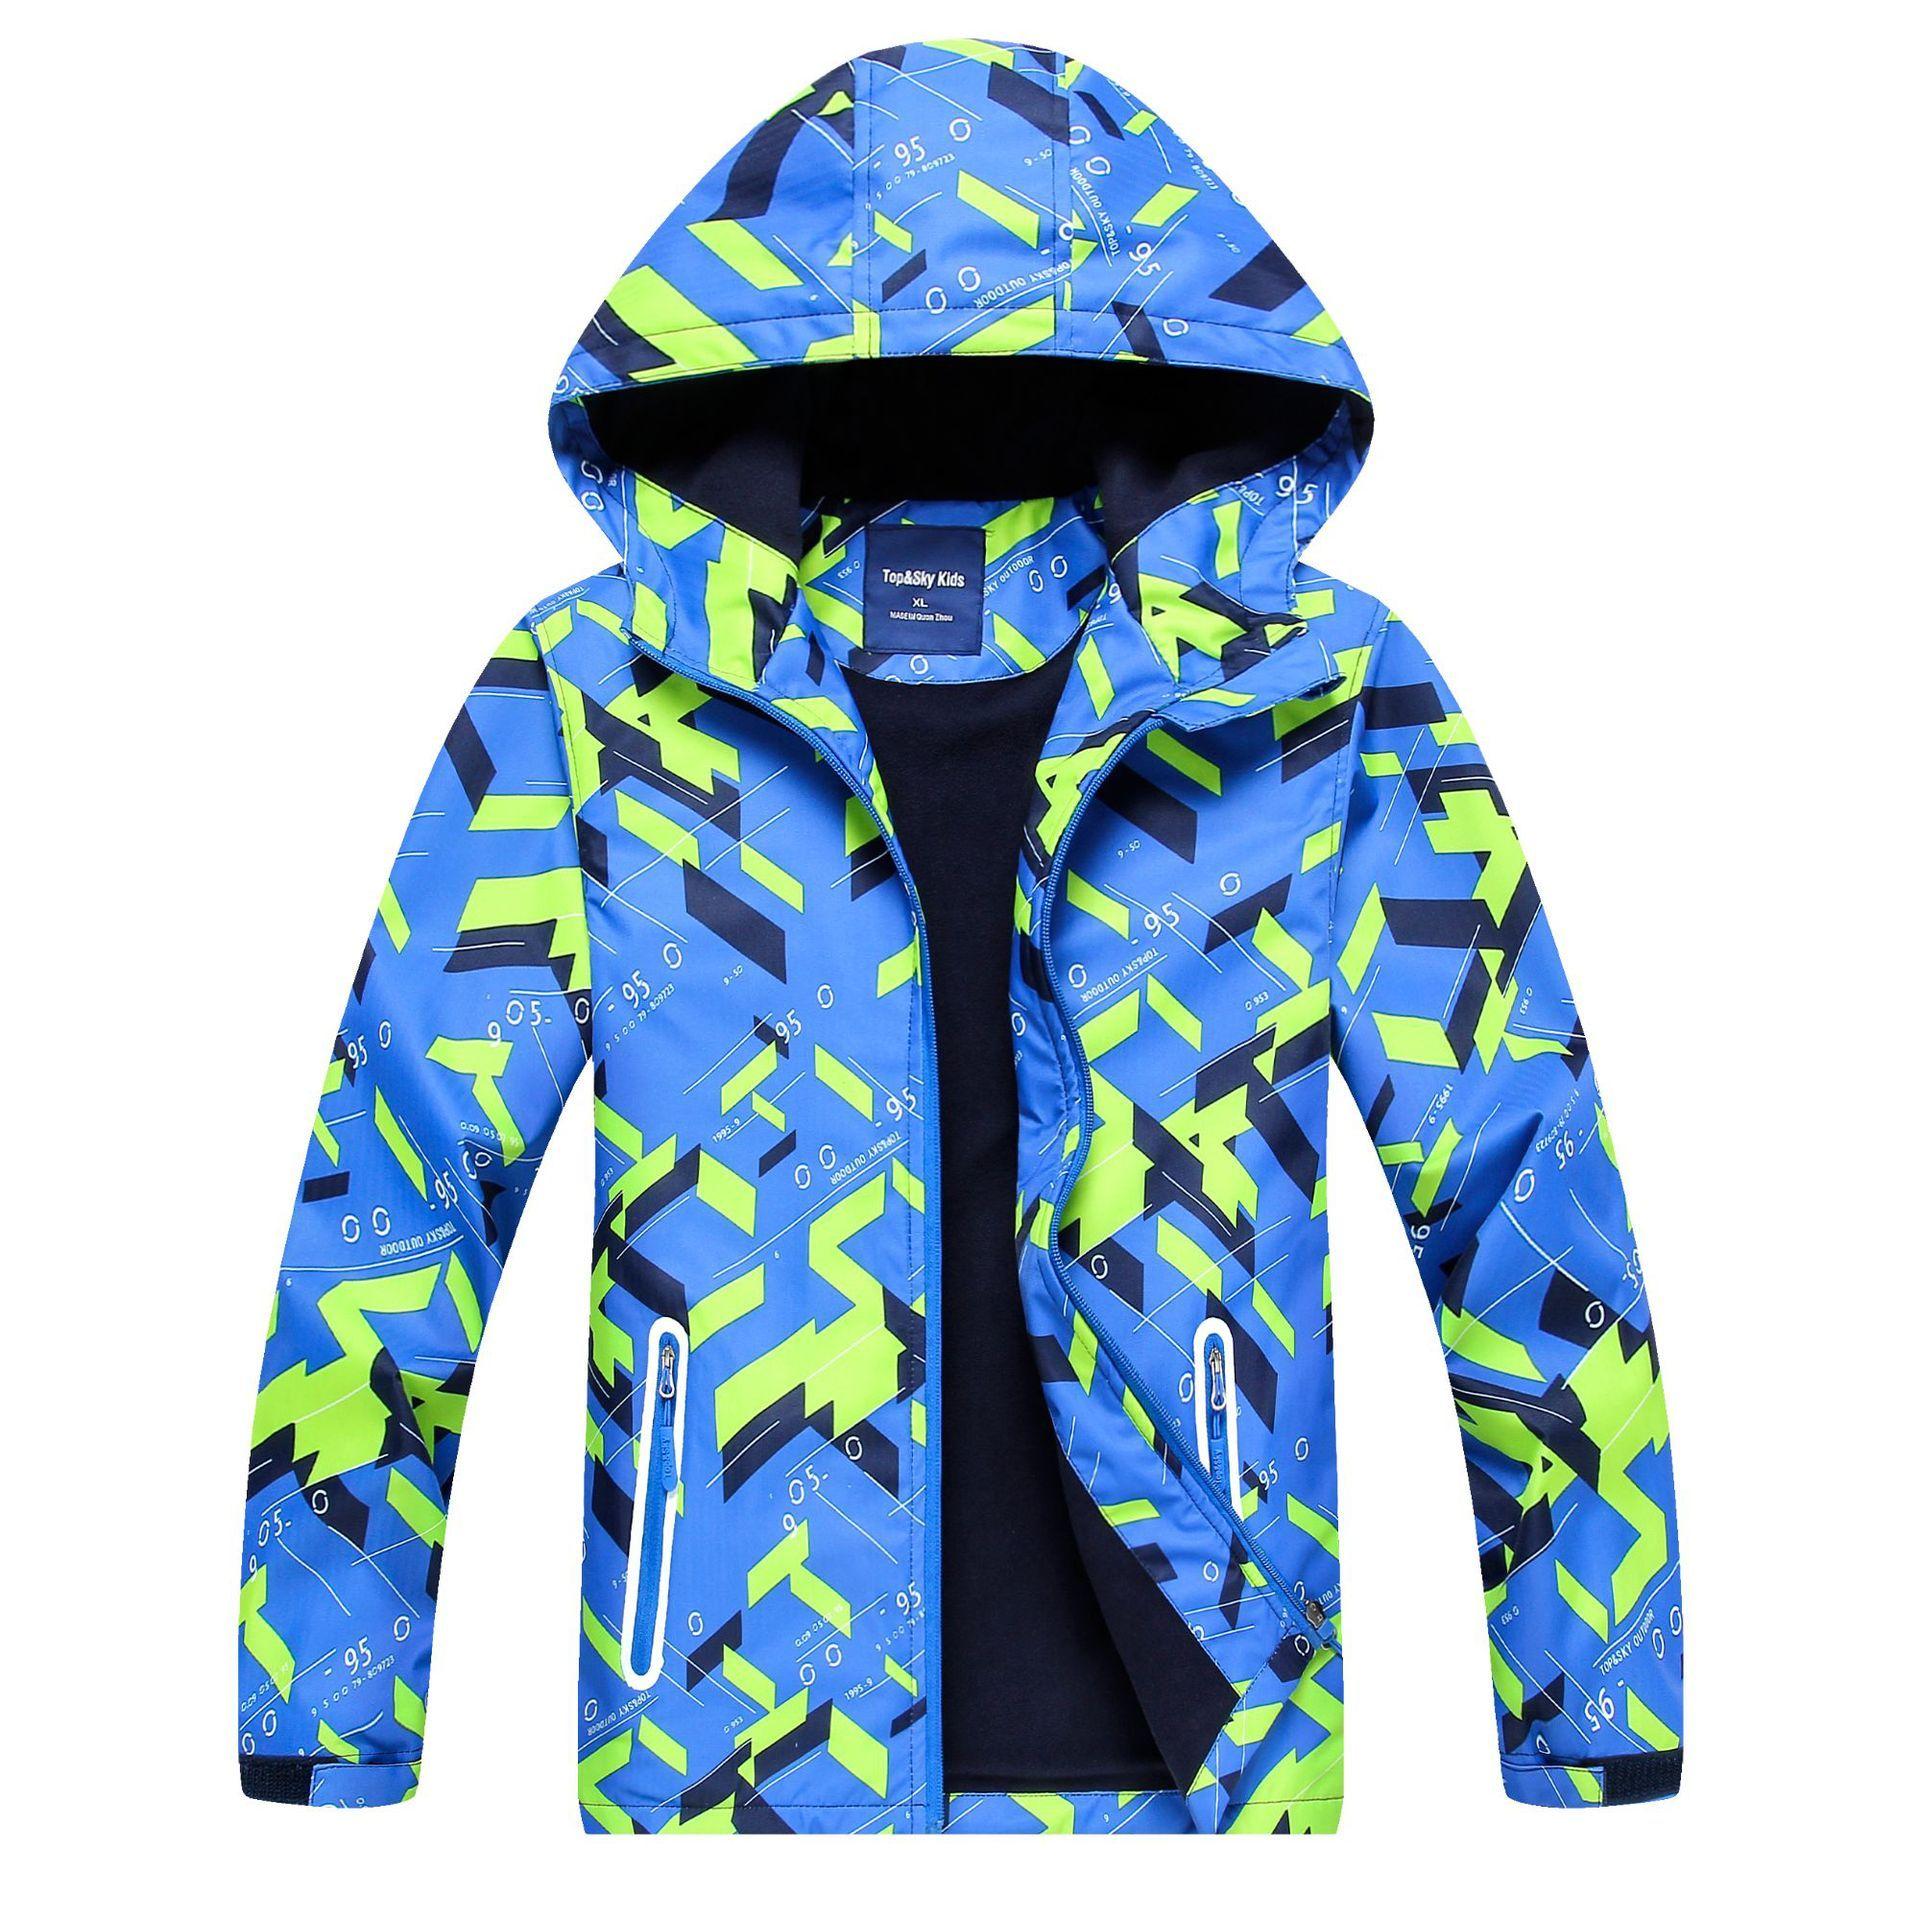 Großhandel Mode Jungen im Freien wasserdicht atmungsaktiv Reißverschluss mit Kapuze bedruckte Jacke Windjacke